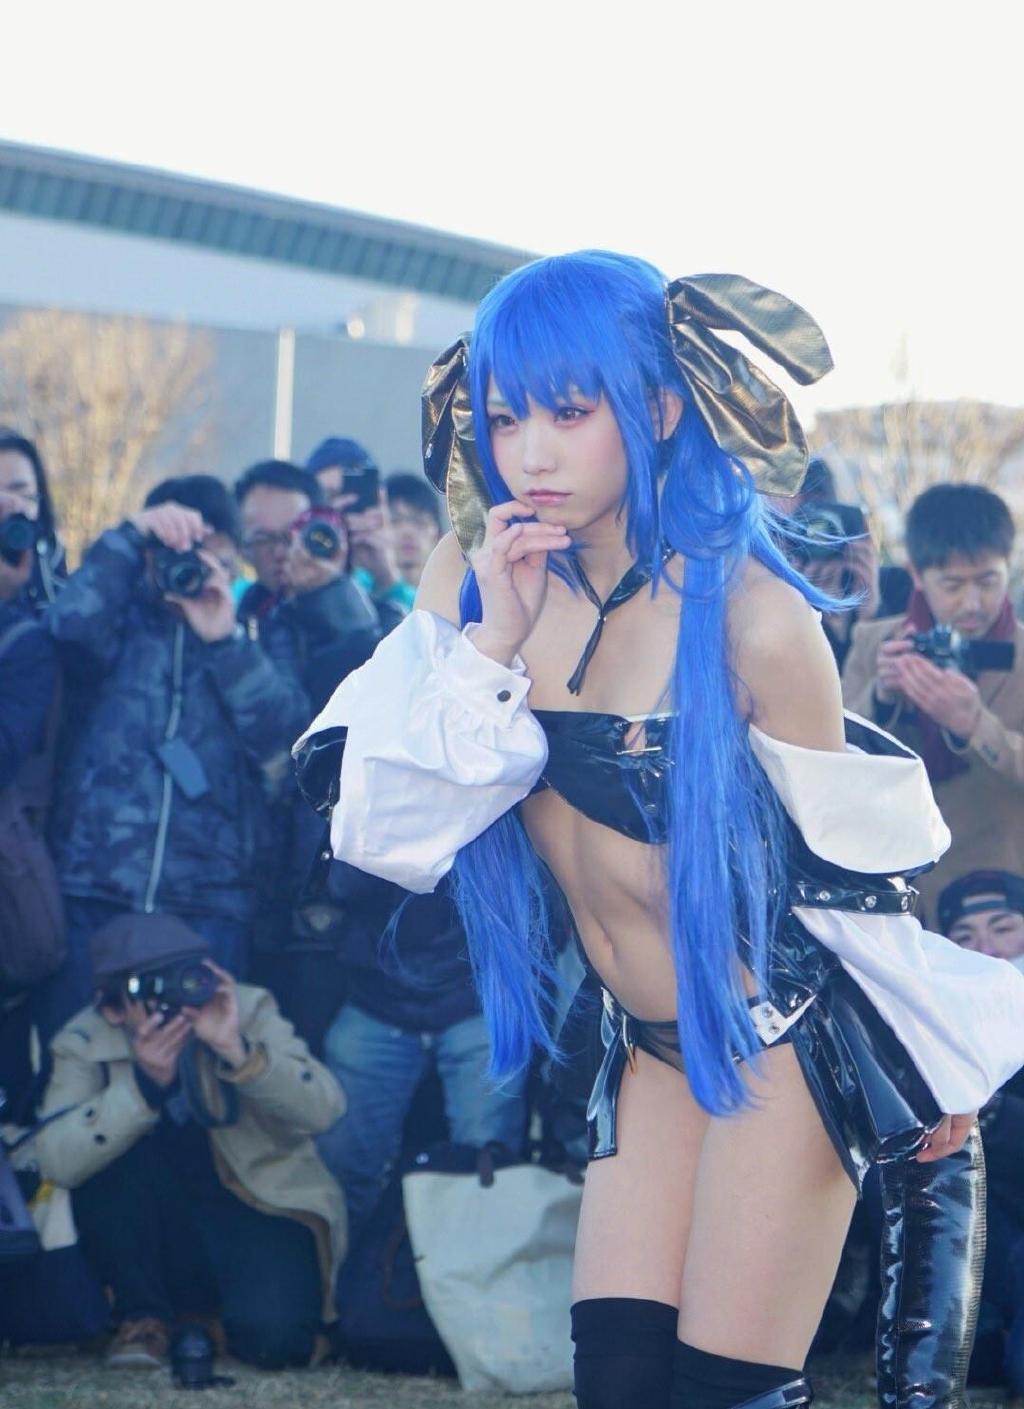 【Cosplay】cosplay动漫2020-11-12-小柚妹站